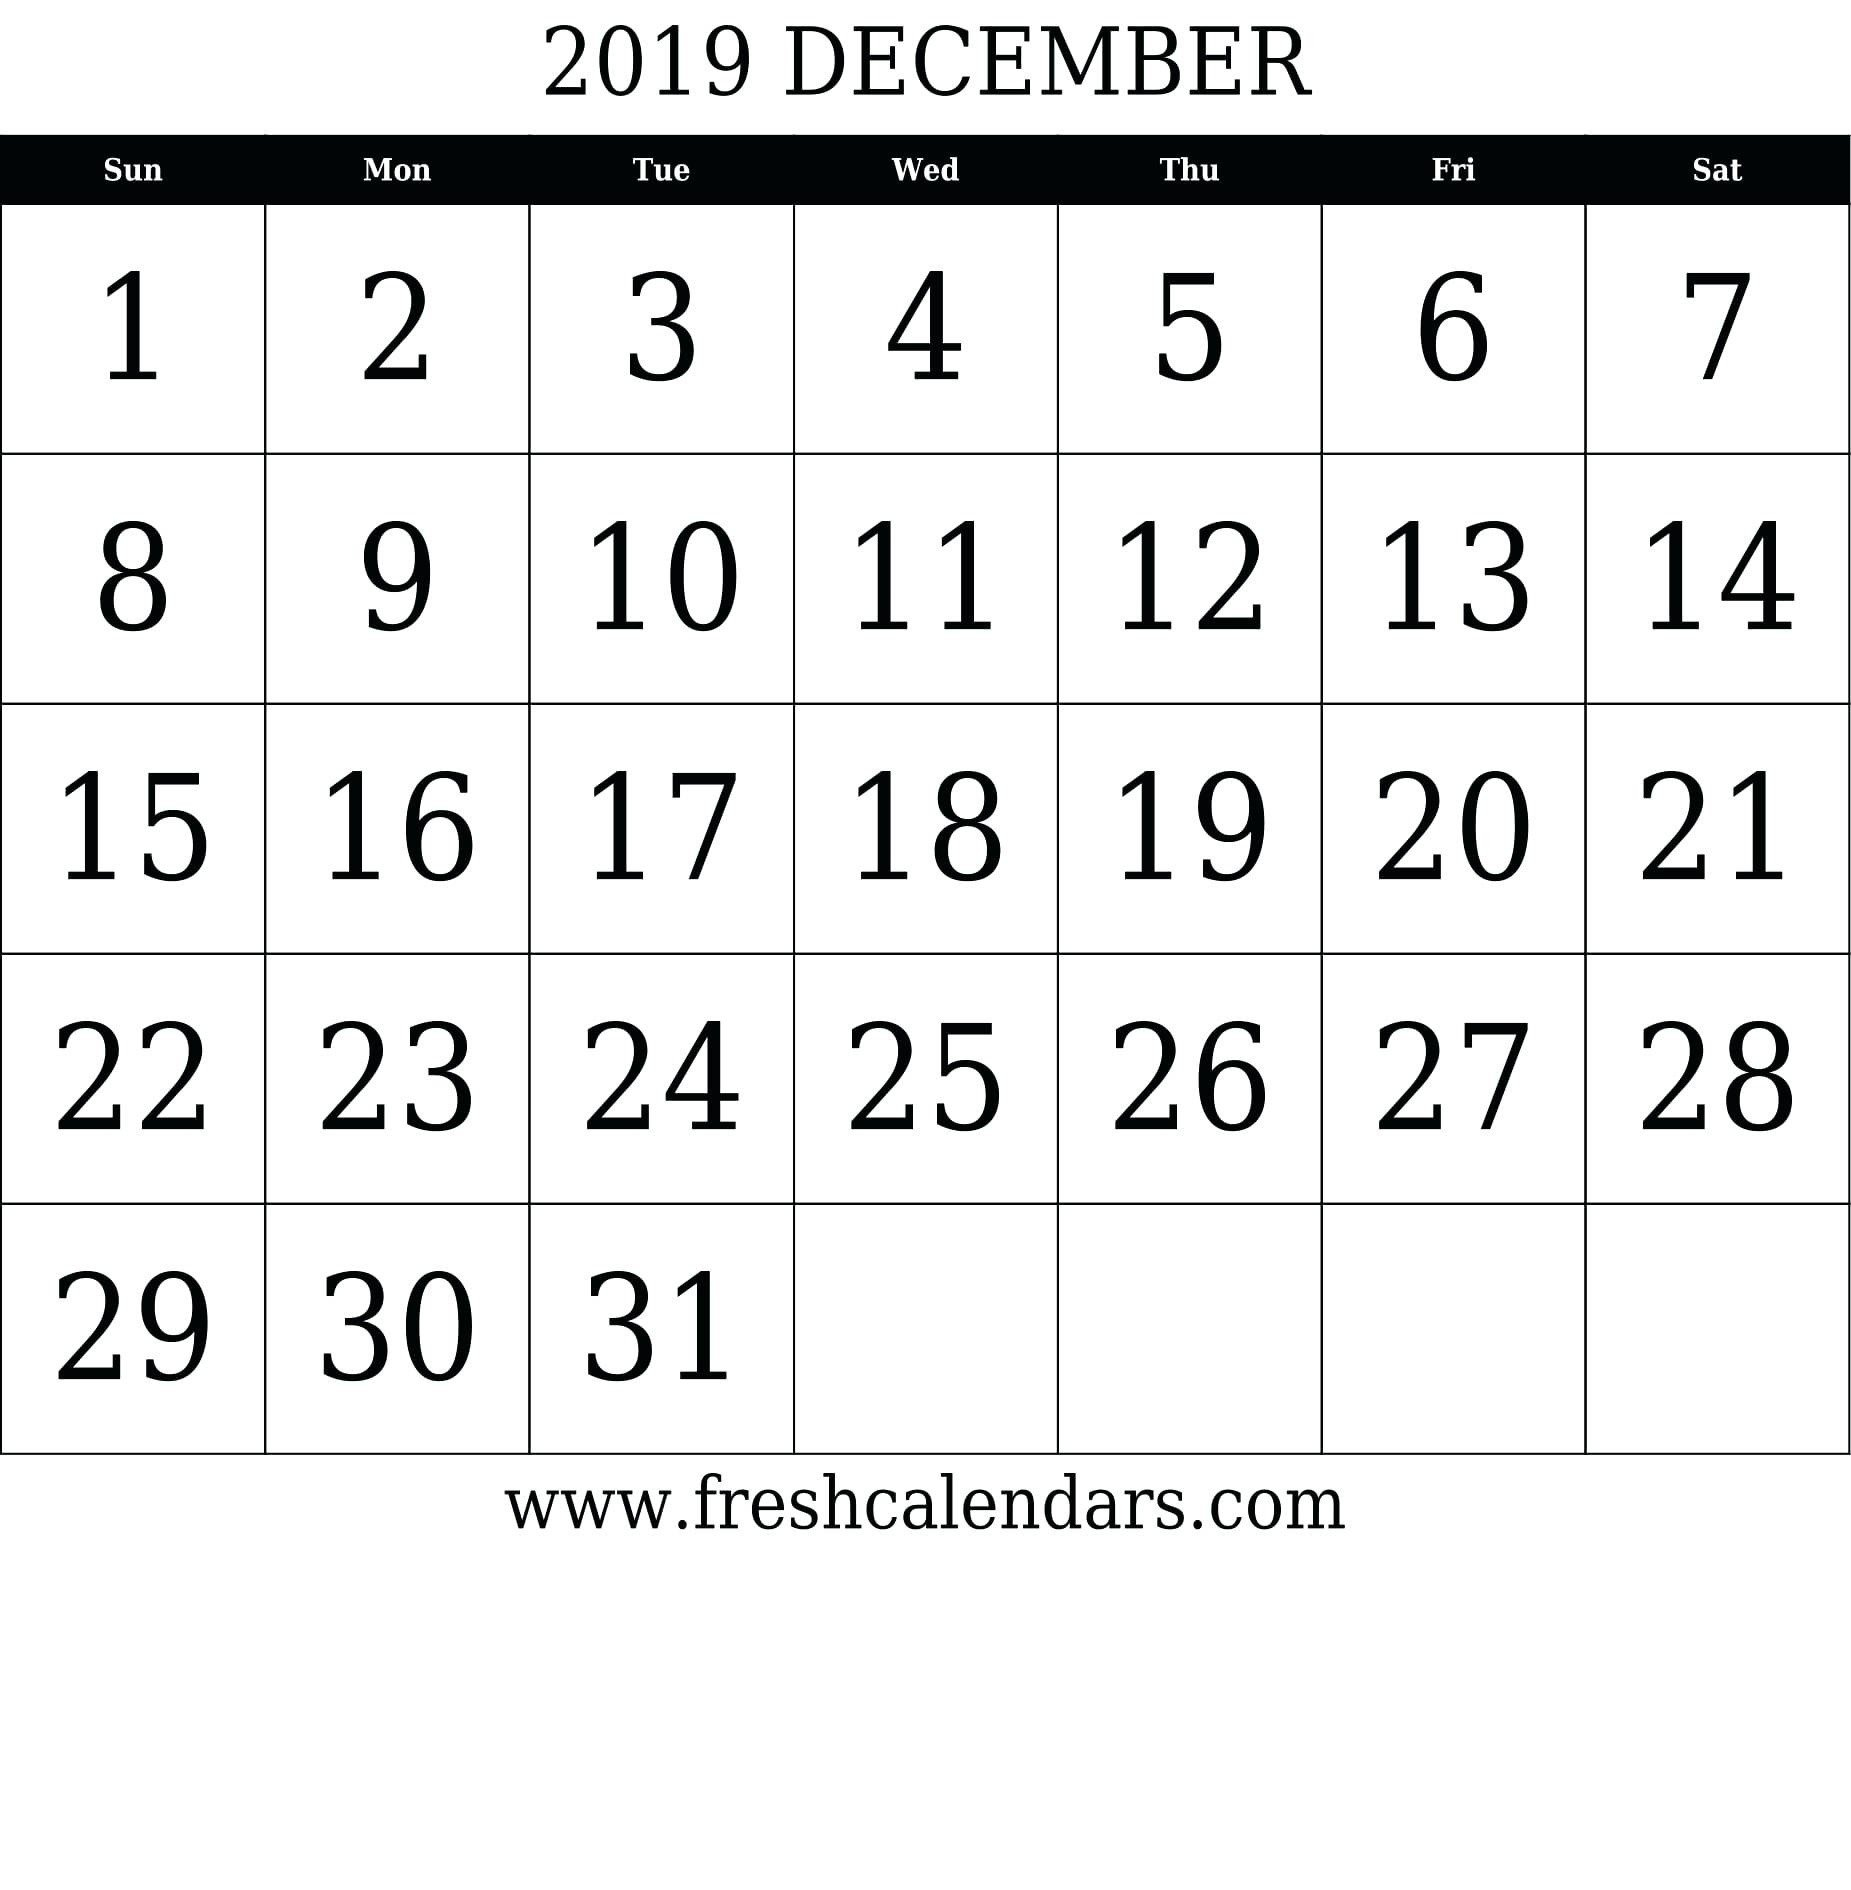 August 2019 - Template Calendar Design 31 Day Blank Calendar Printable